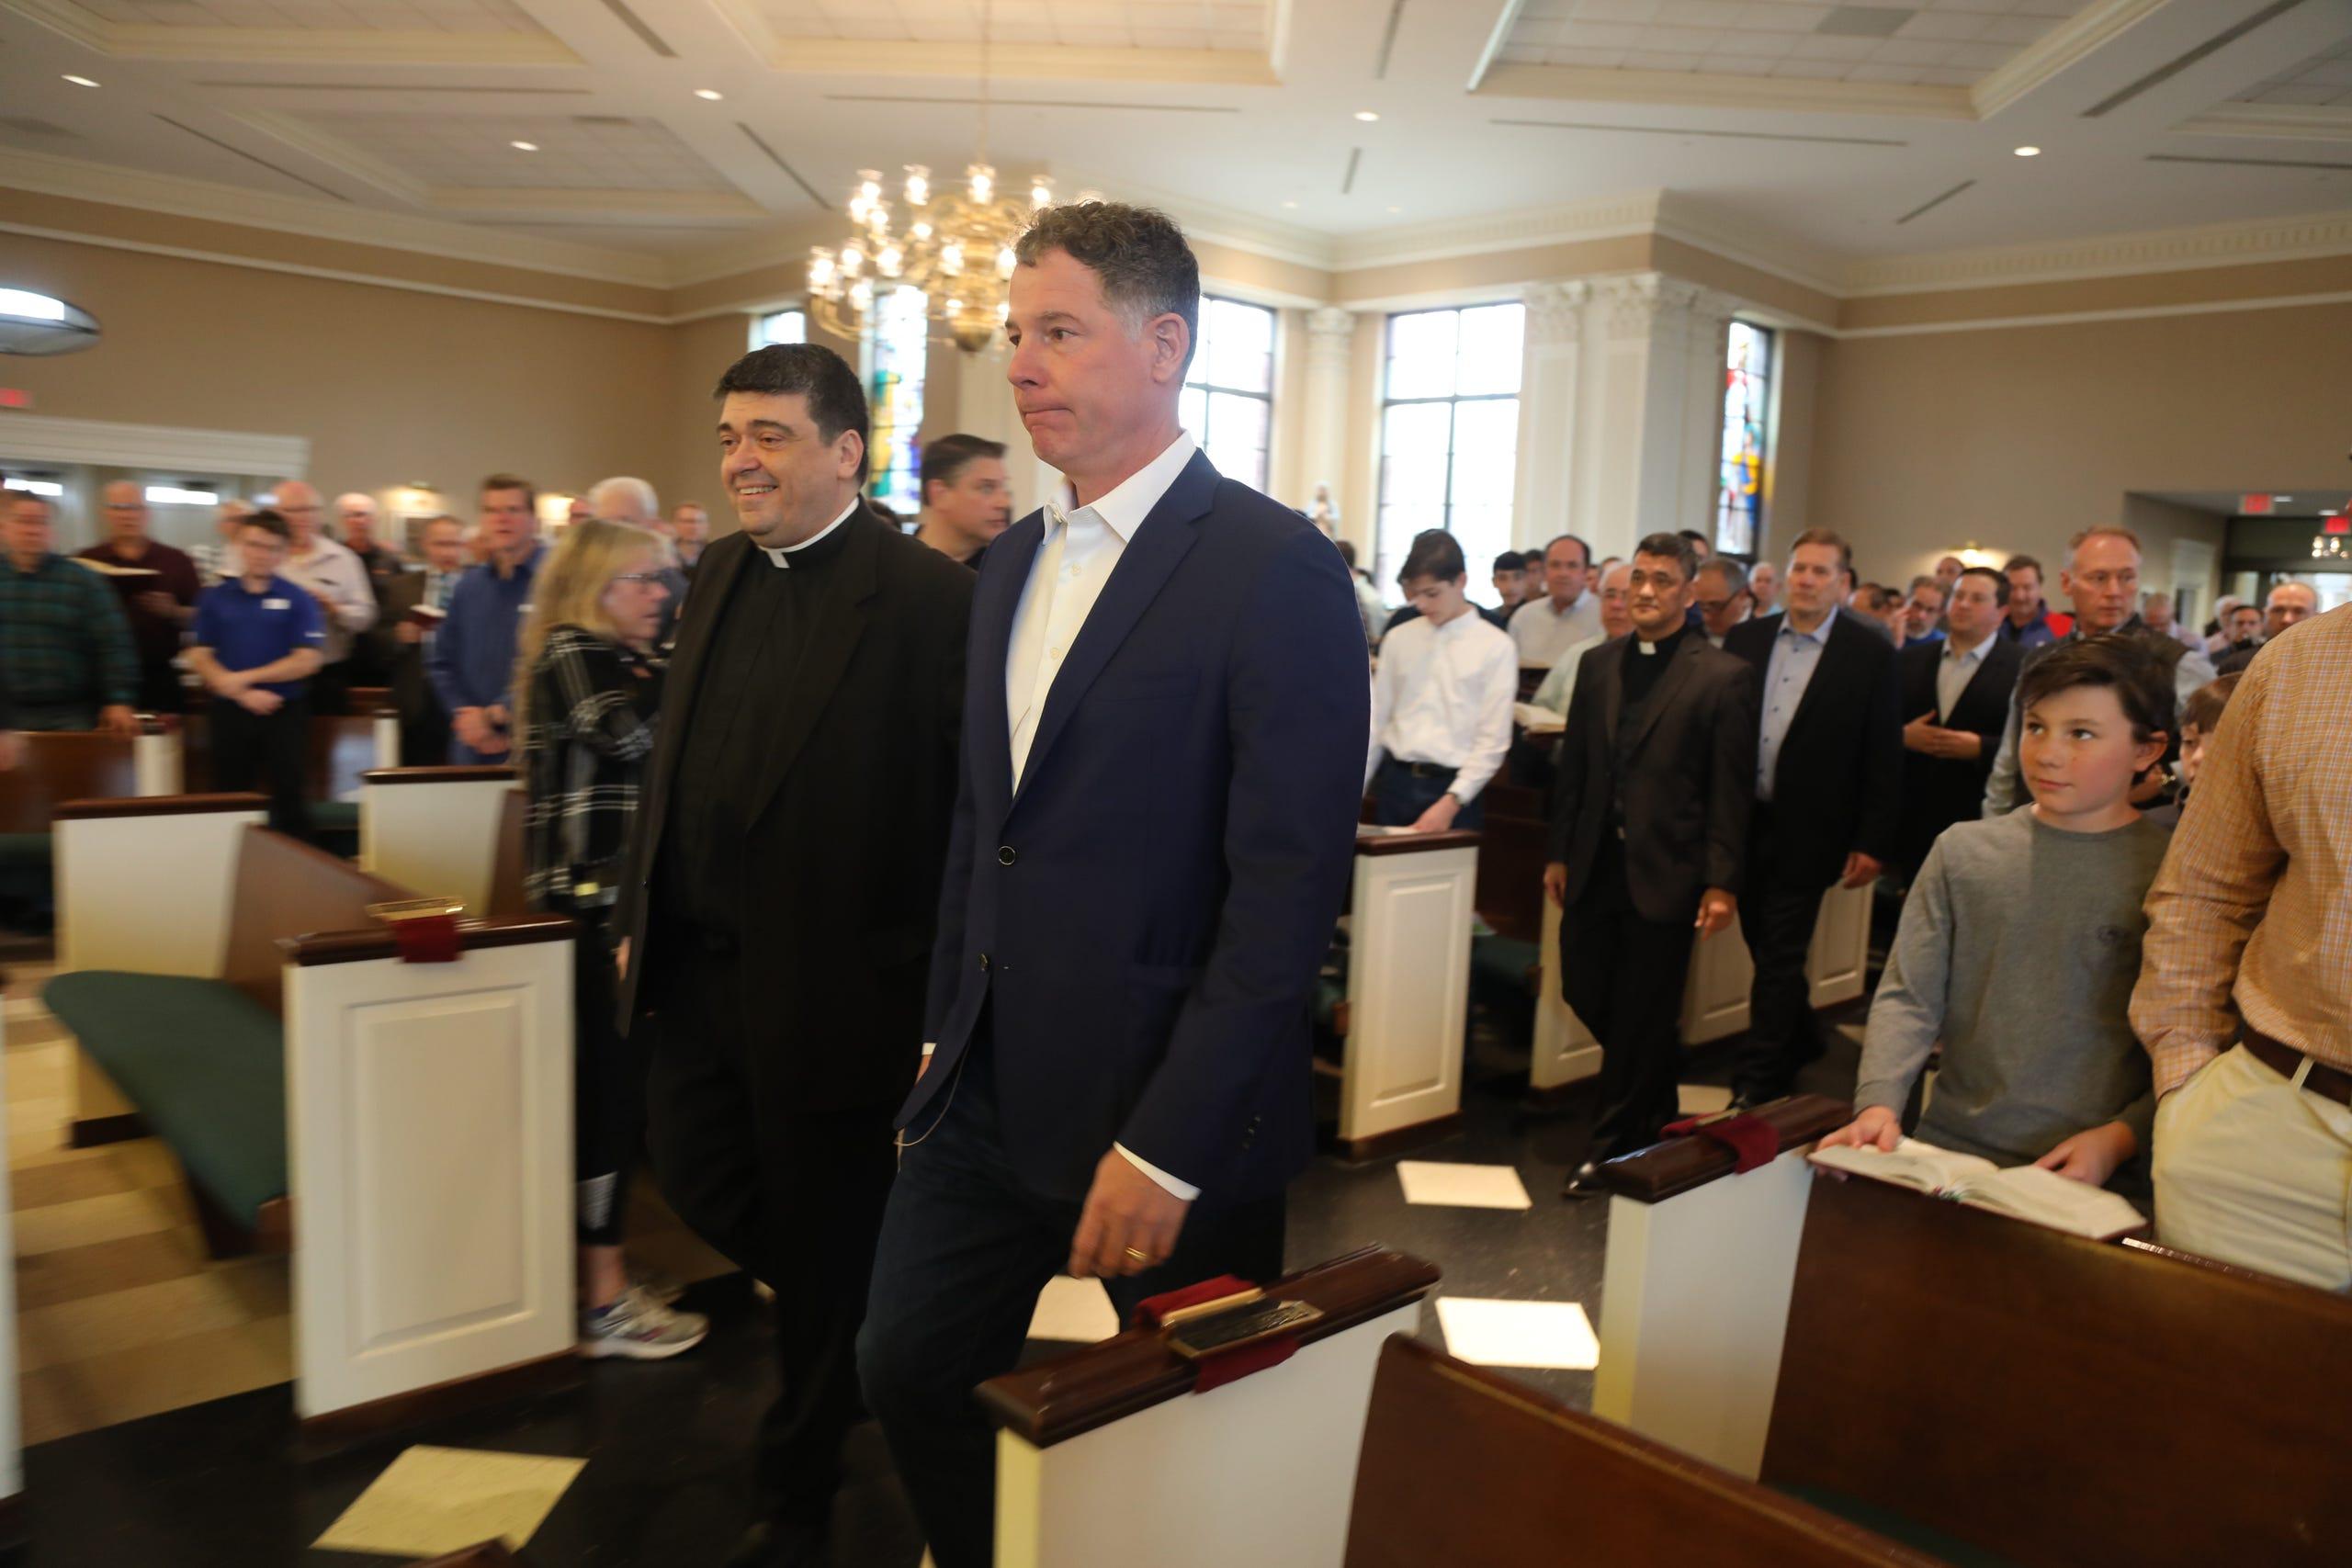 Ny Giants Coach Pat Shurmur Speaks At St James Church